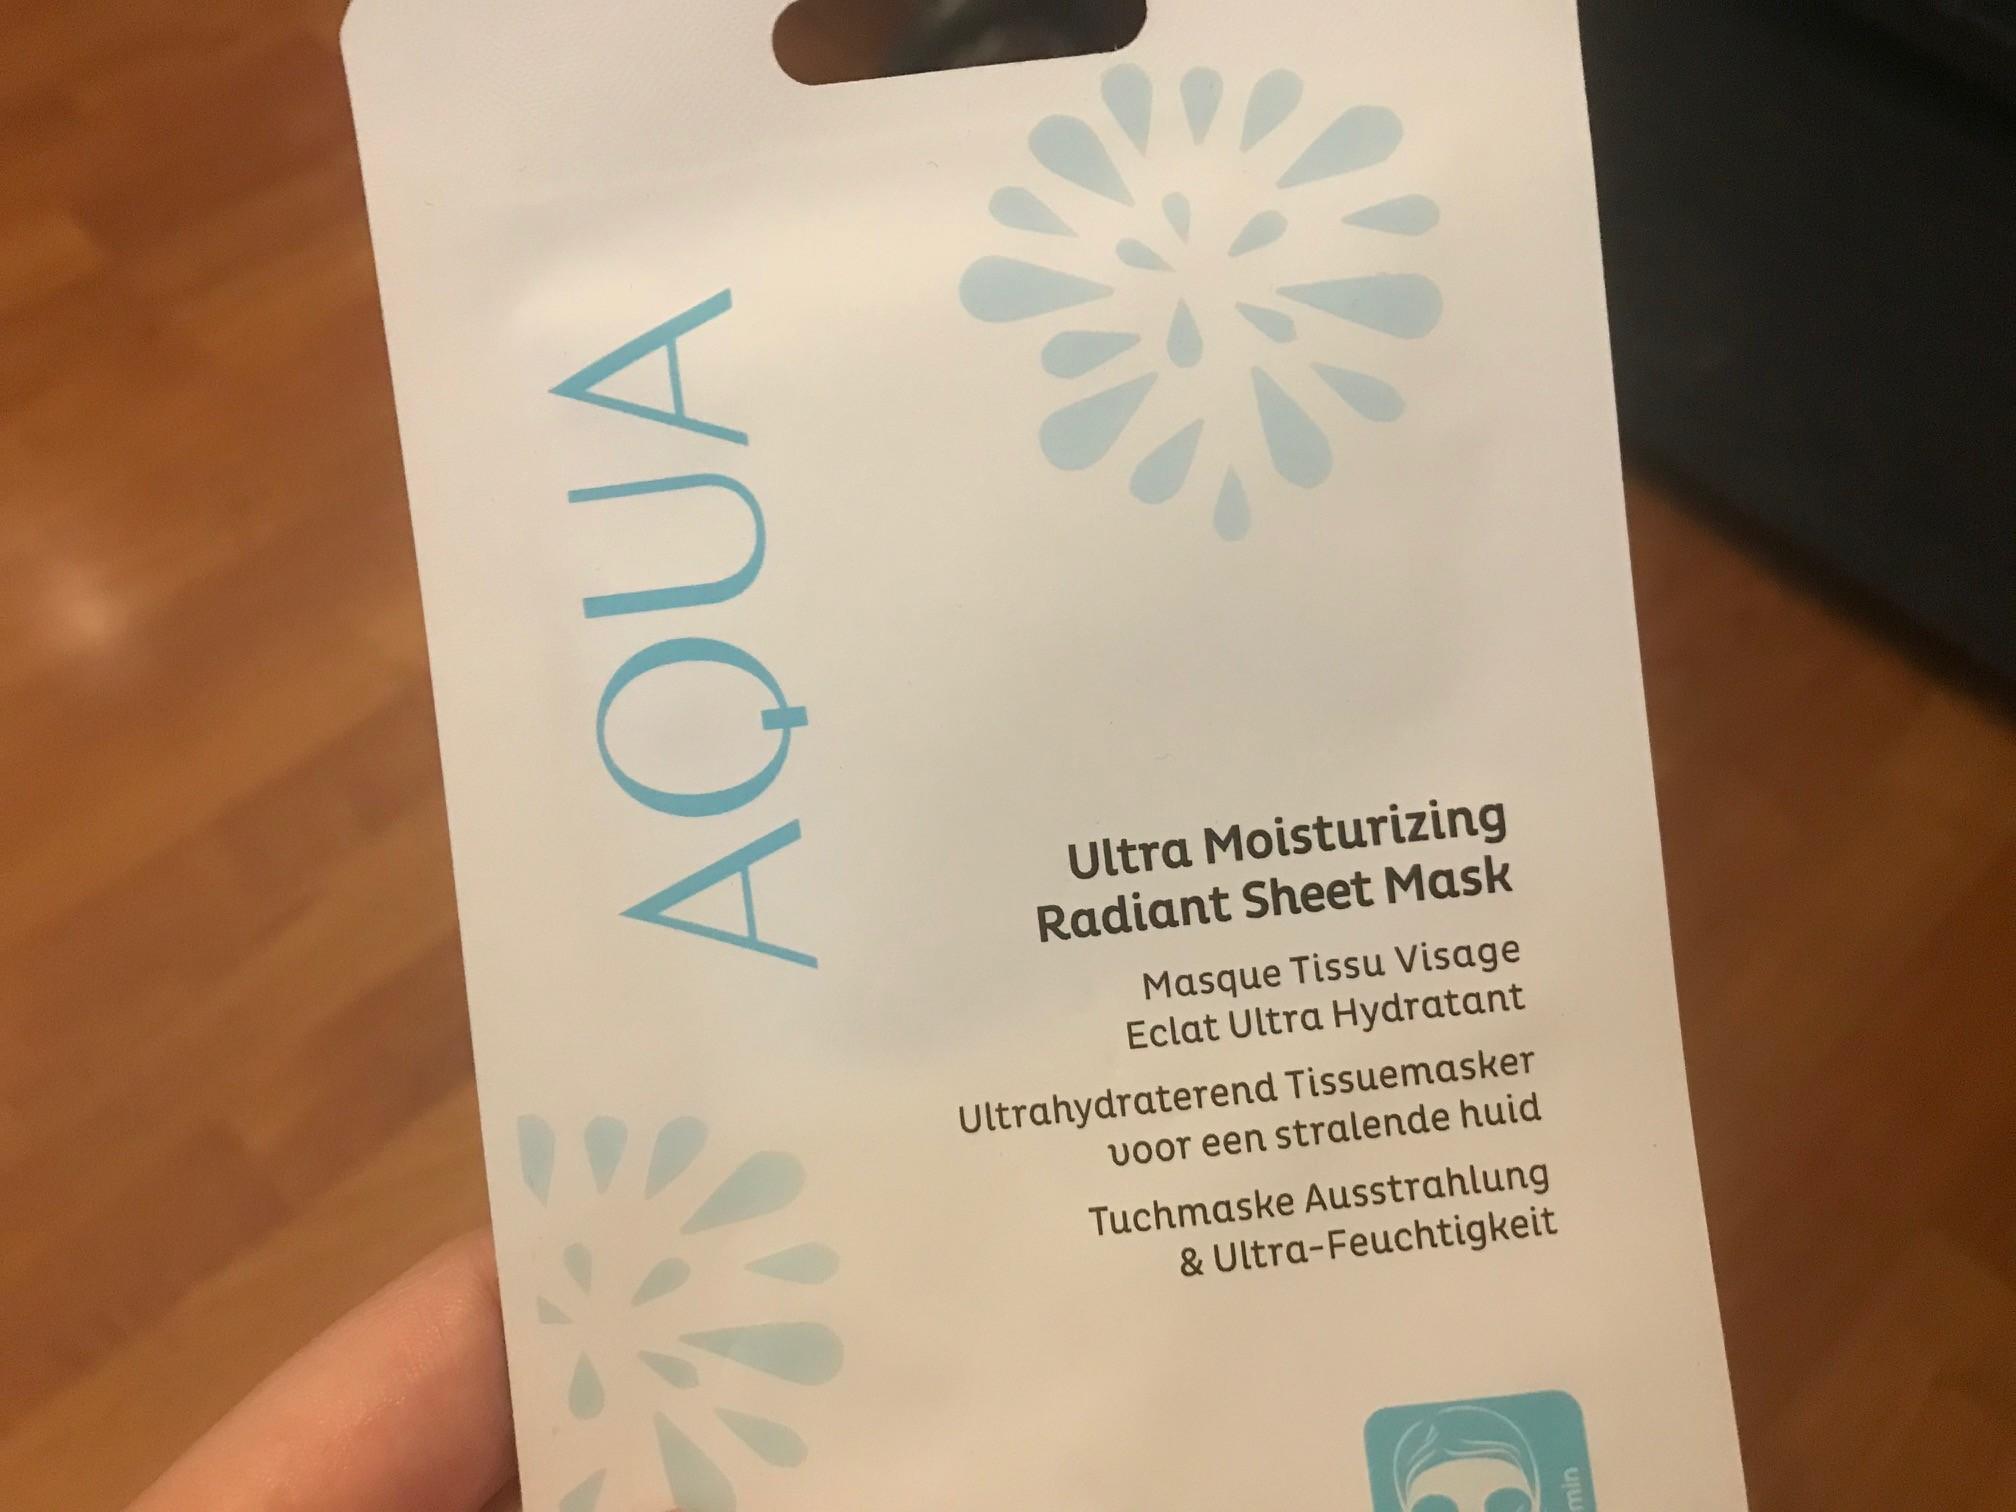 aqua ultrahydraterend tissuemasker